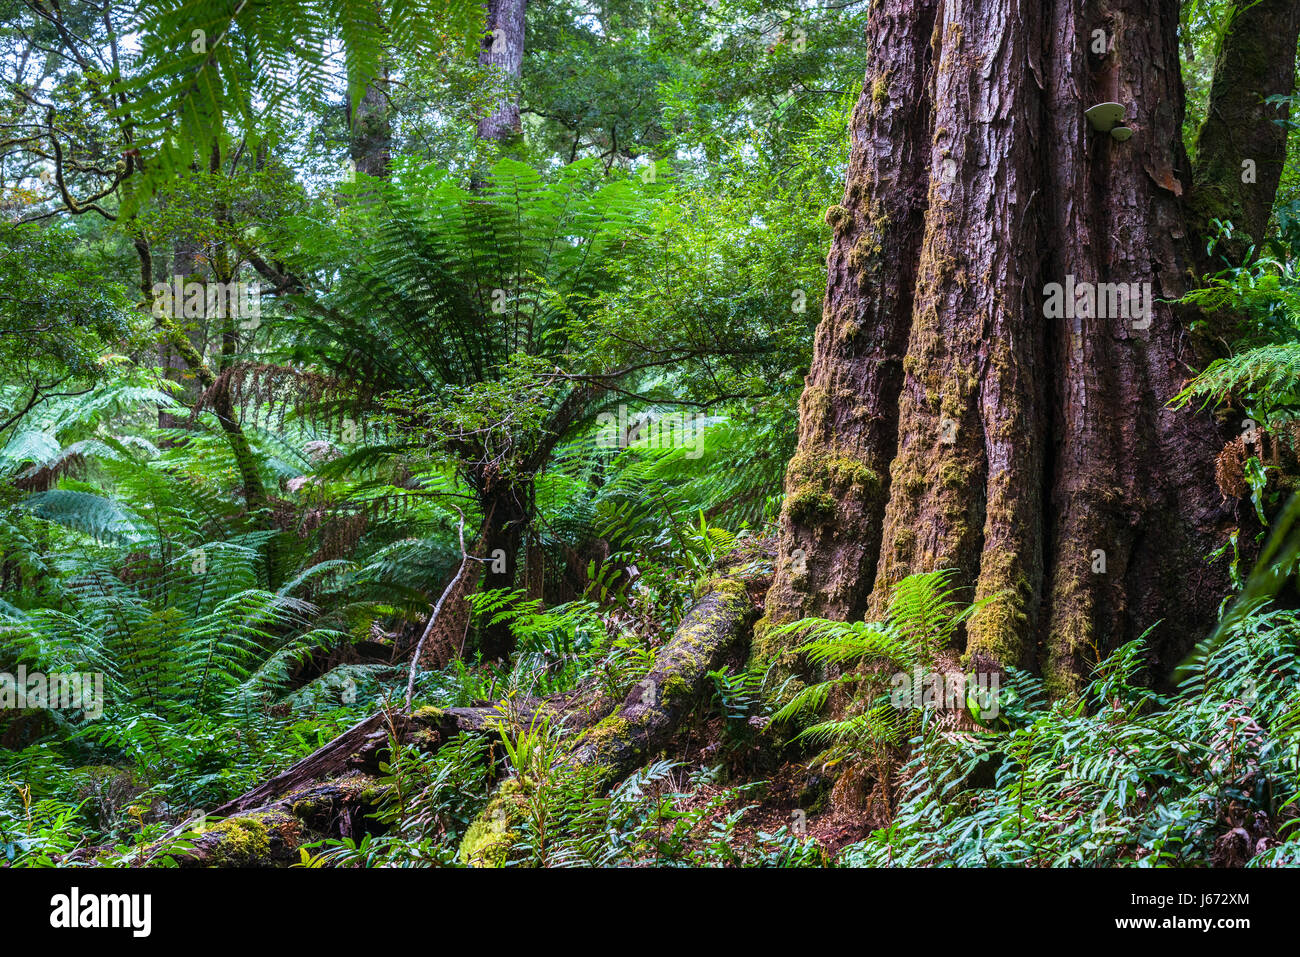 Dicksonia antarctica Rain forest à Melba Gully State Park, Great Otway National Park, Vitoria, de l'Australie. Photo Stock